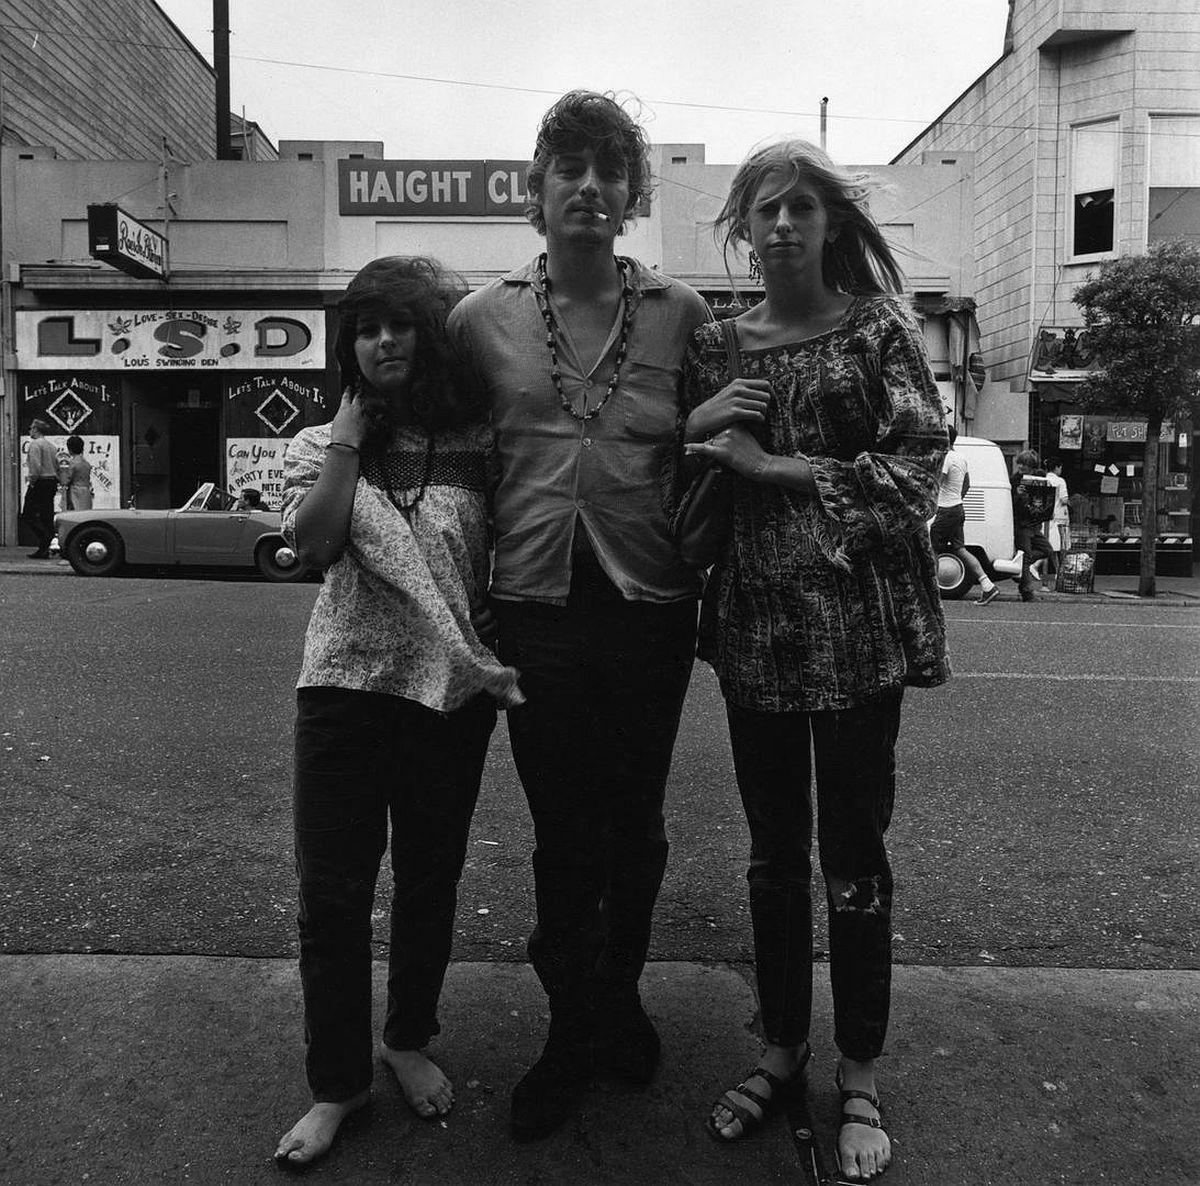 Haight Ashbury 1968